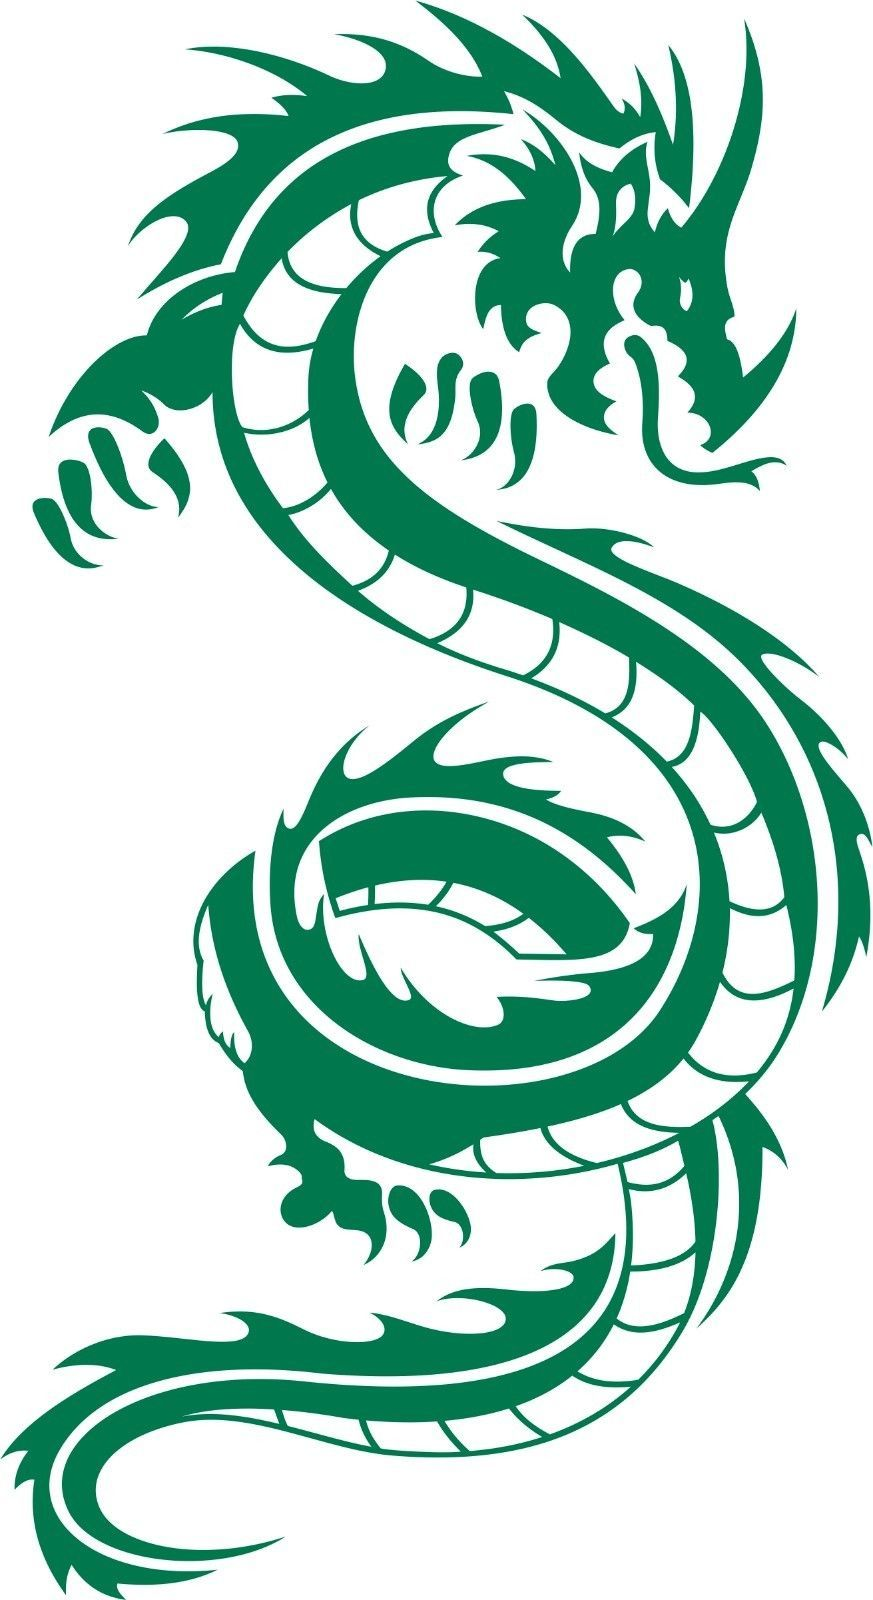 5 99 Dragon Mythical Creature Beast Car Truck Window Laptop Vinyl Decal Sticker Ebay Home Garden Mystical Tattoos Small Dragon Tattoos Dragon Tattoo [ 1600 x 873 Pixel ]